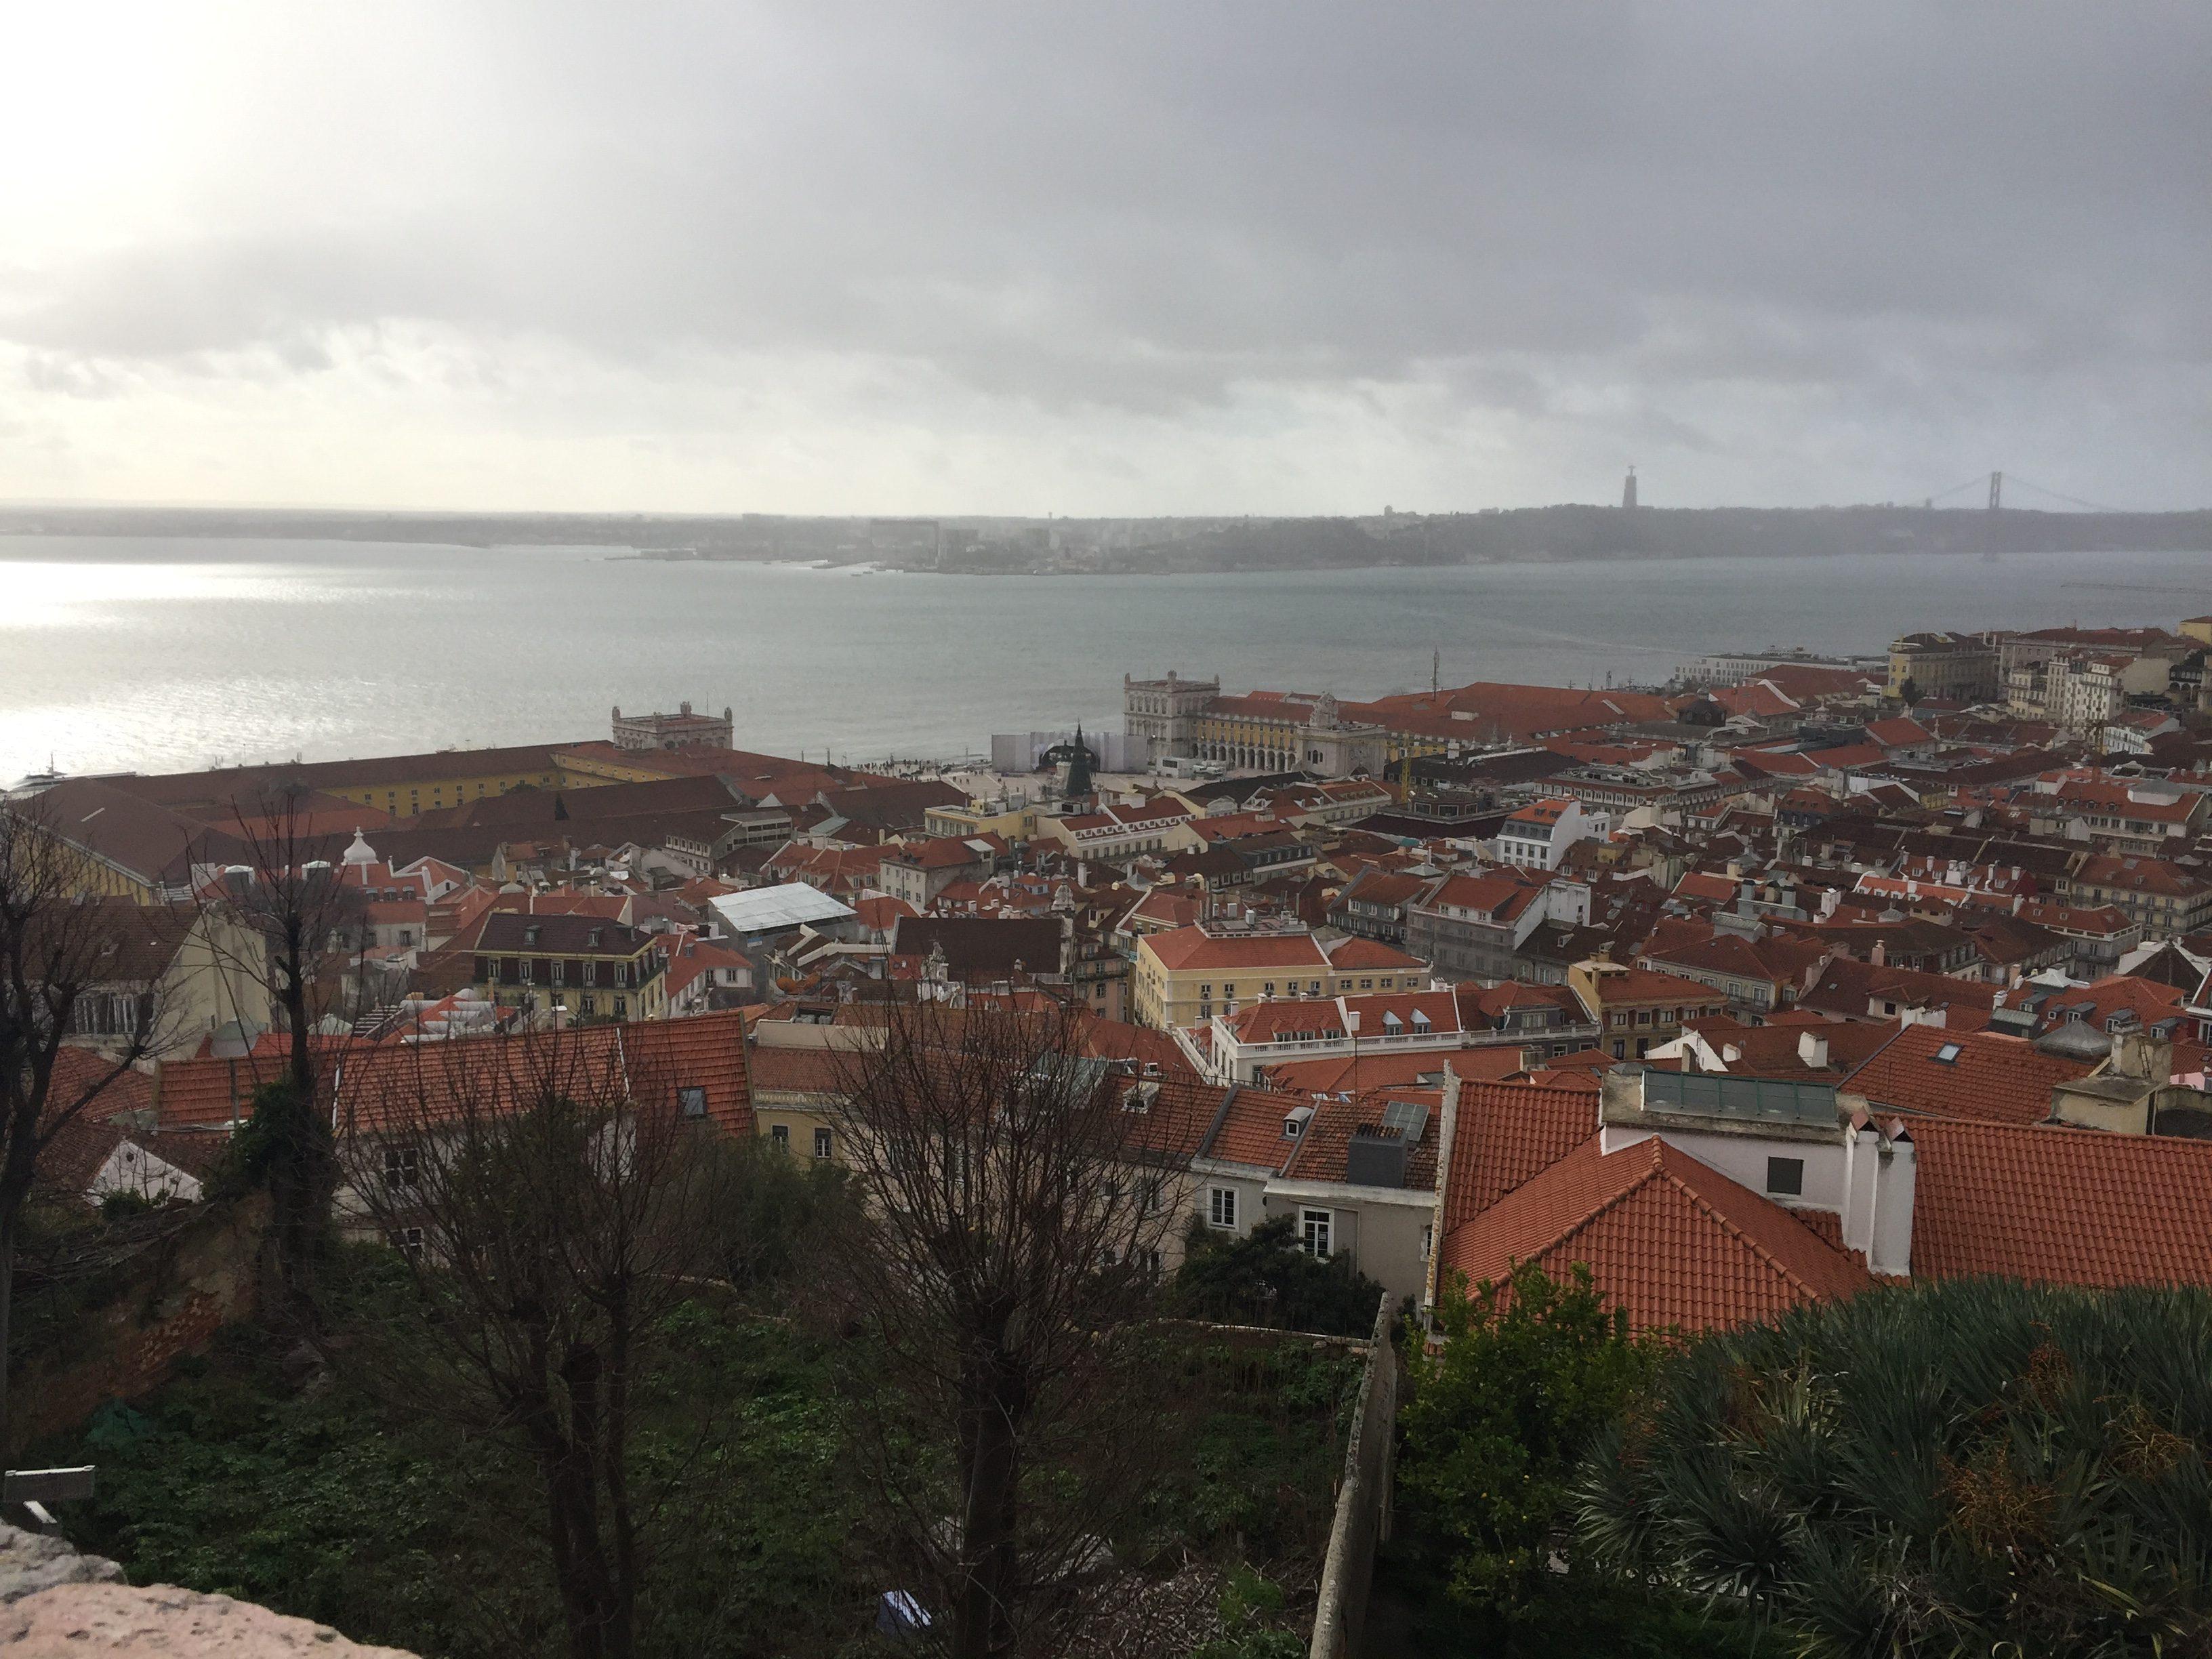 IMG 22501 e1515635454903 - Lugares para visitar en Lisboa (Parte II/II)